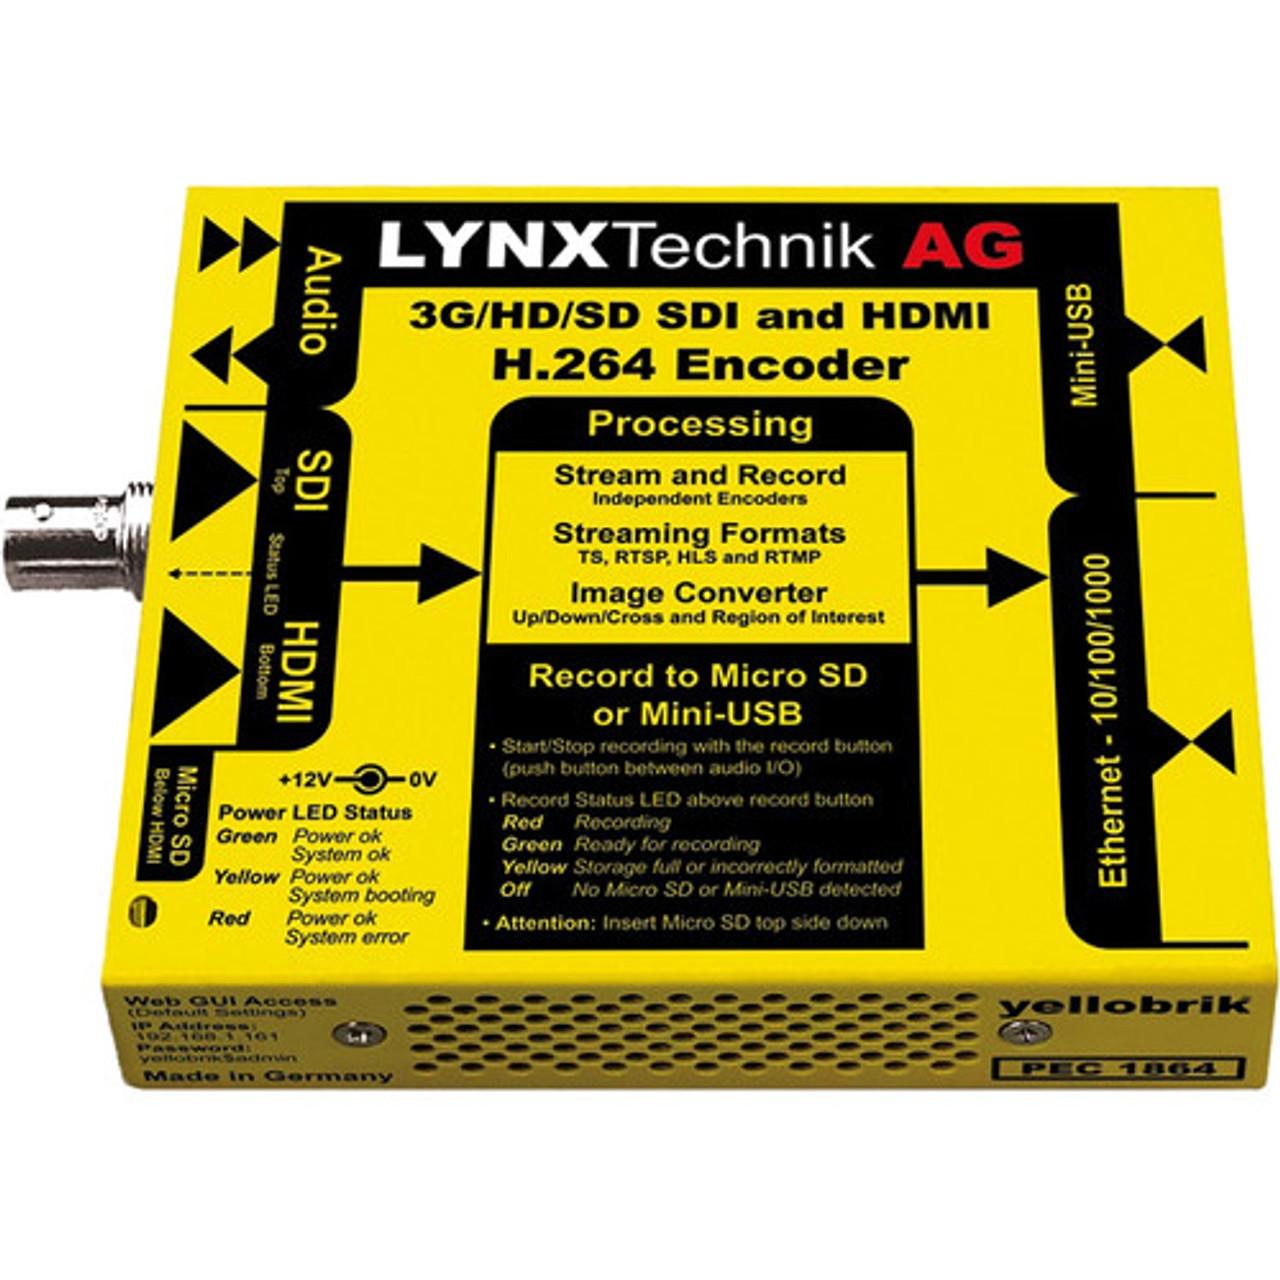 Lynx Technik AG yellobrik PEC 1864 3G-SDI/HDMI H 264 Streamer & Recorder